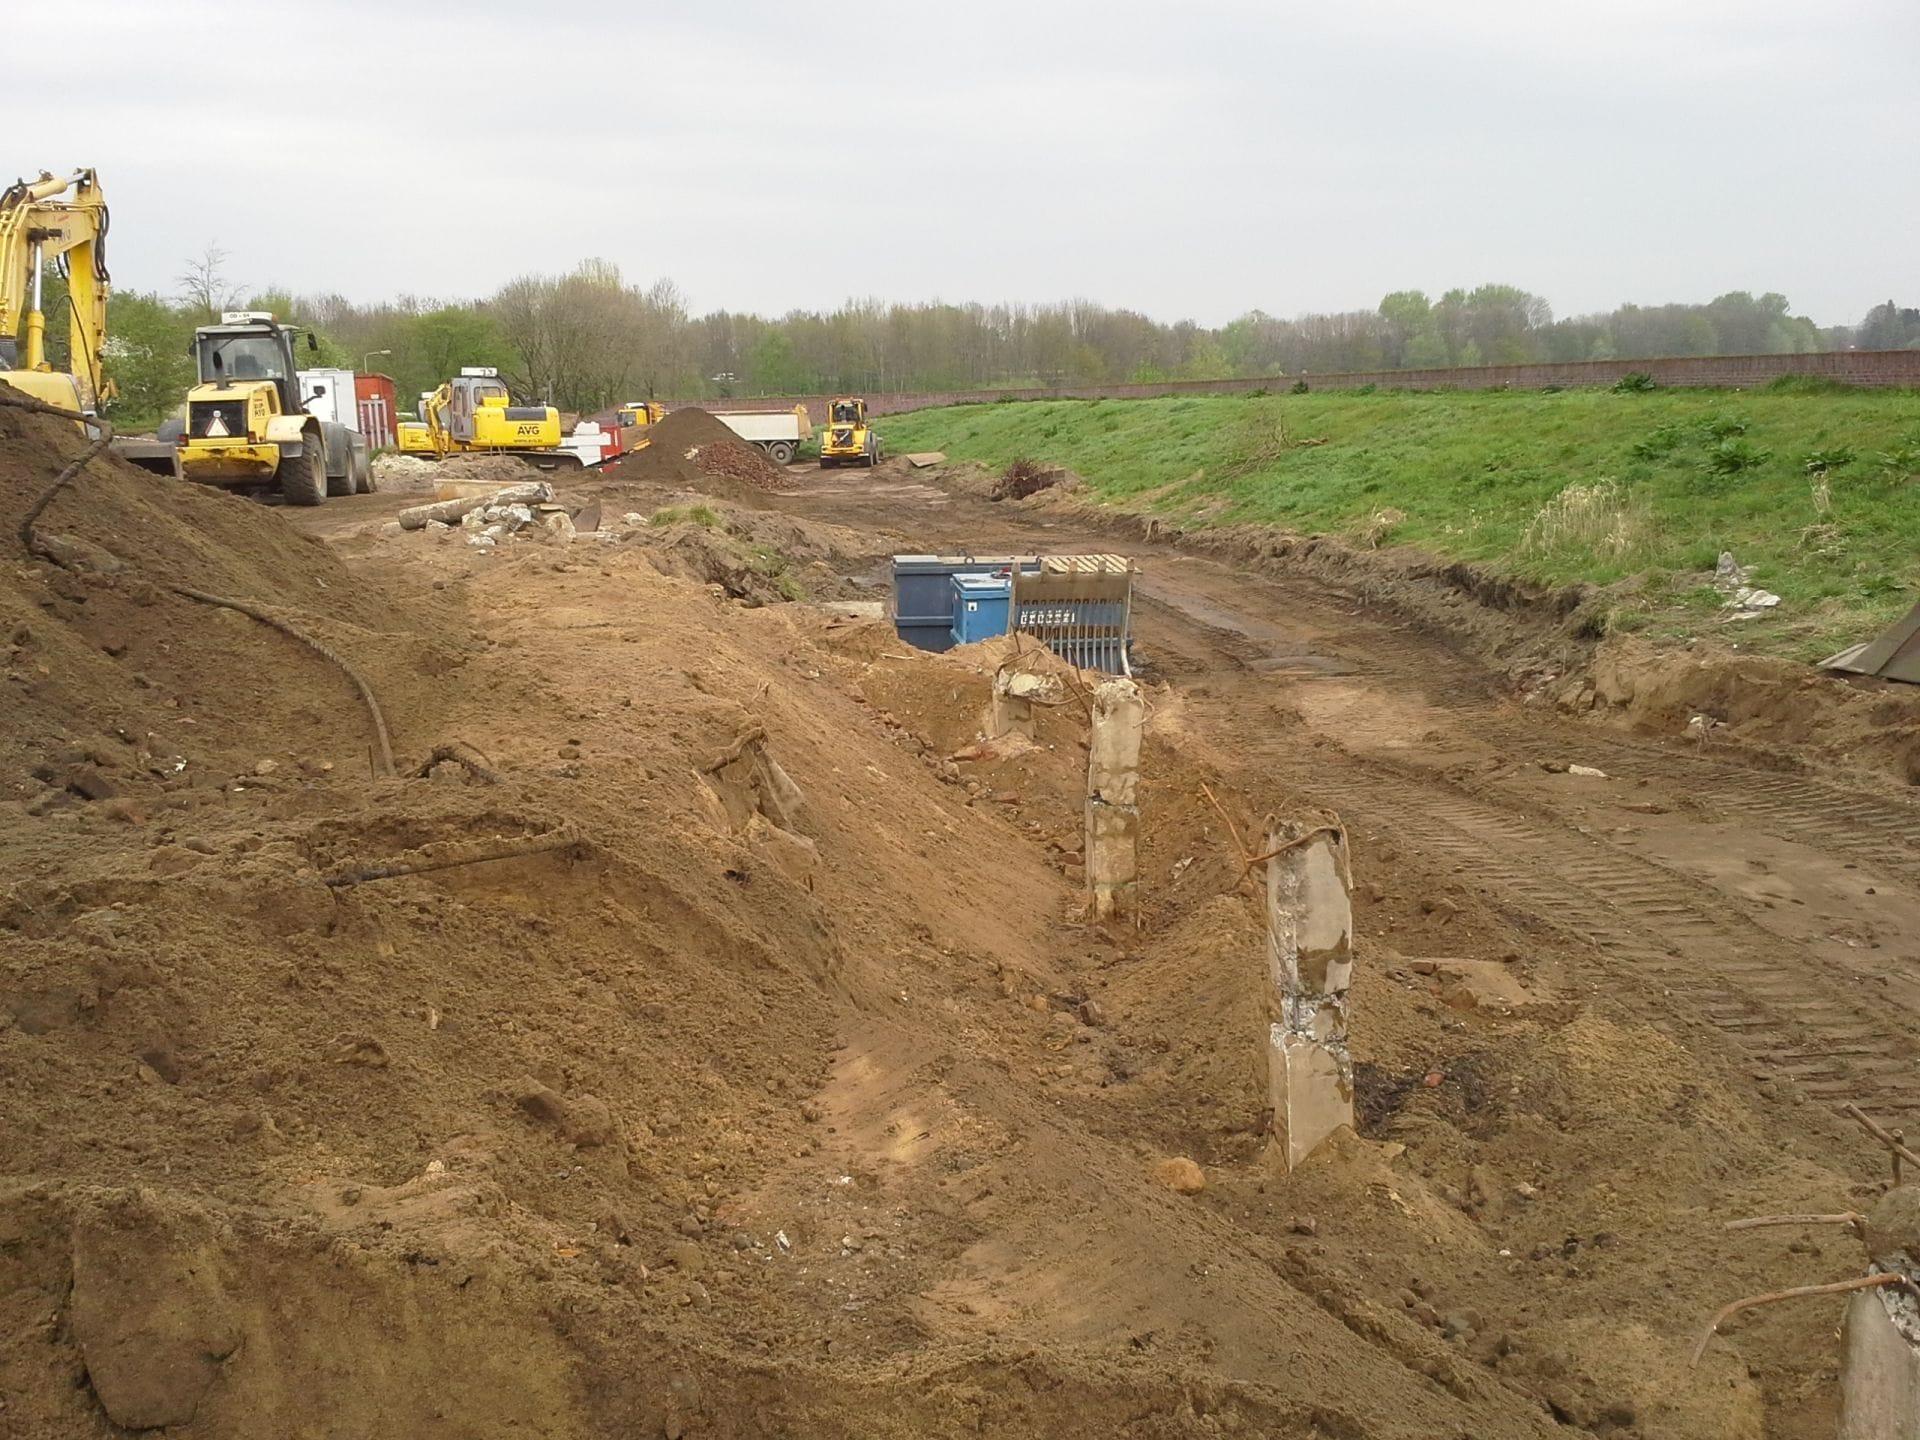 bodemonderzoek-infrastructuur-AVG-Infra-Nederland-bodemsanering-bodemonderzoek-brabant-gelderland-limburg